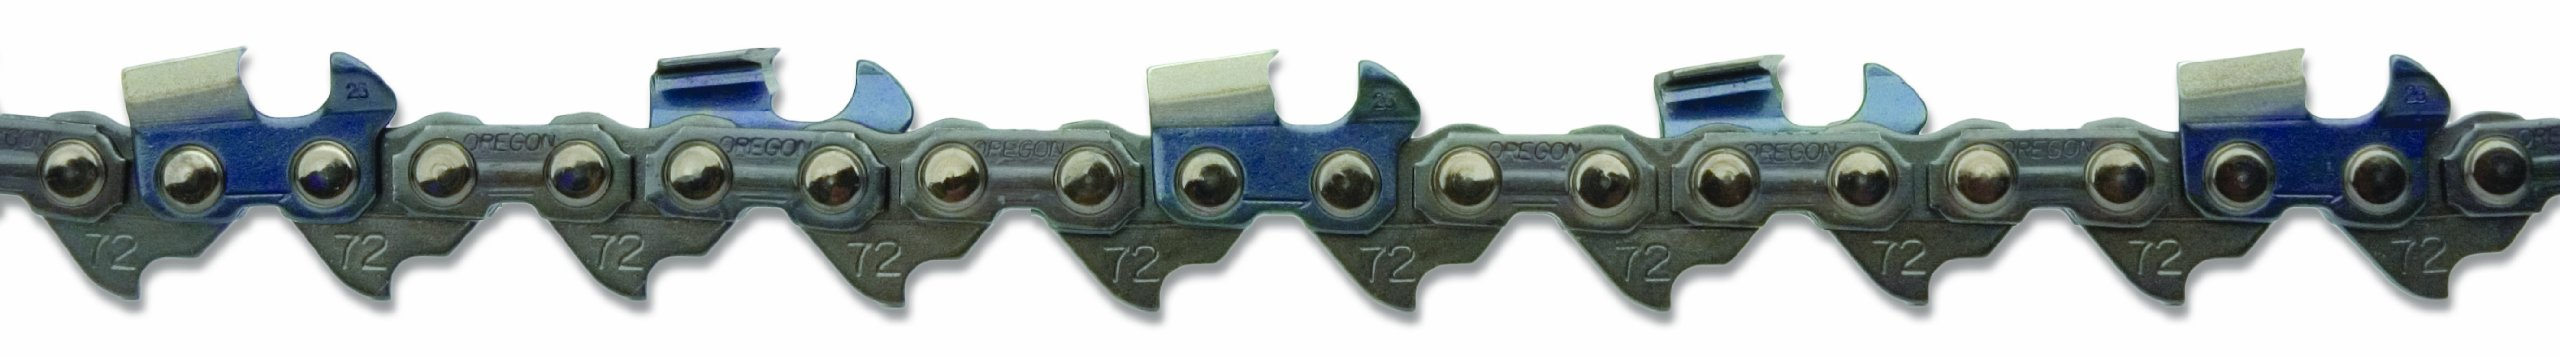 OREGON 72LGX084G 84 Drive Link Super Guard Chain, 3/8-Inch